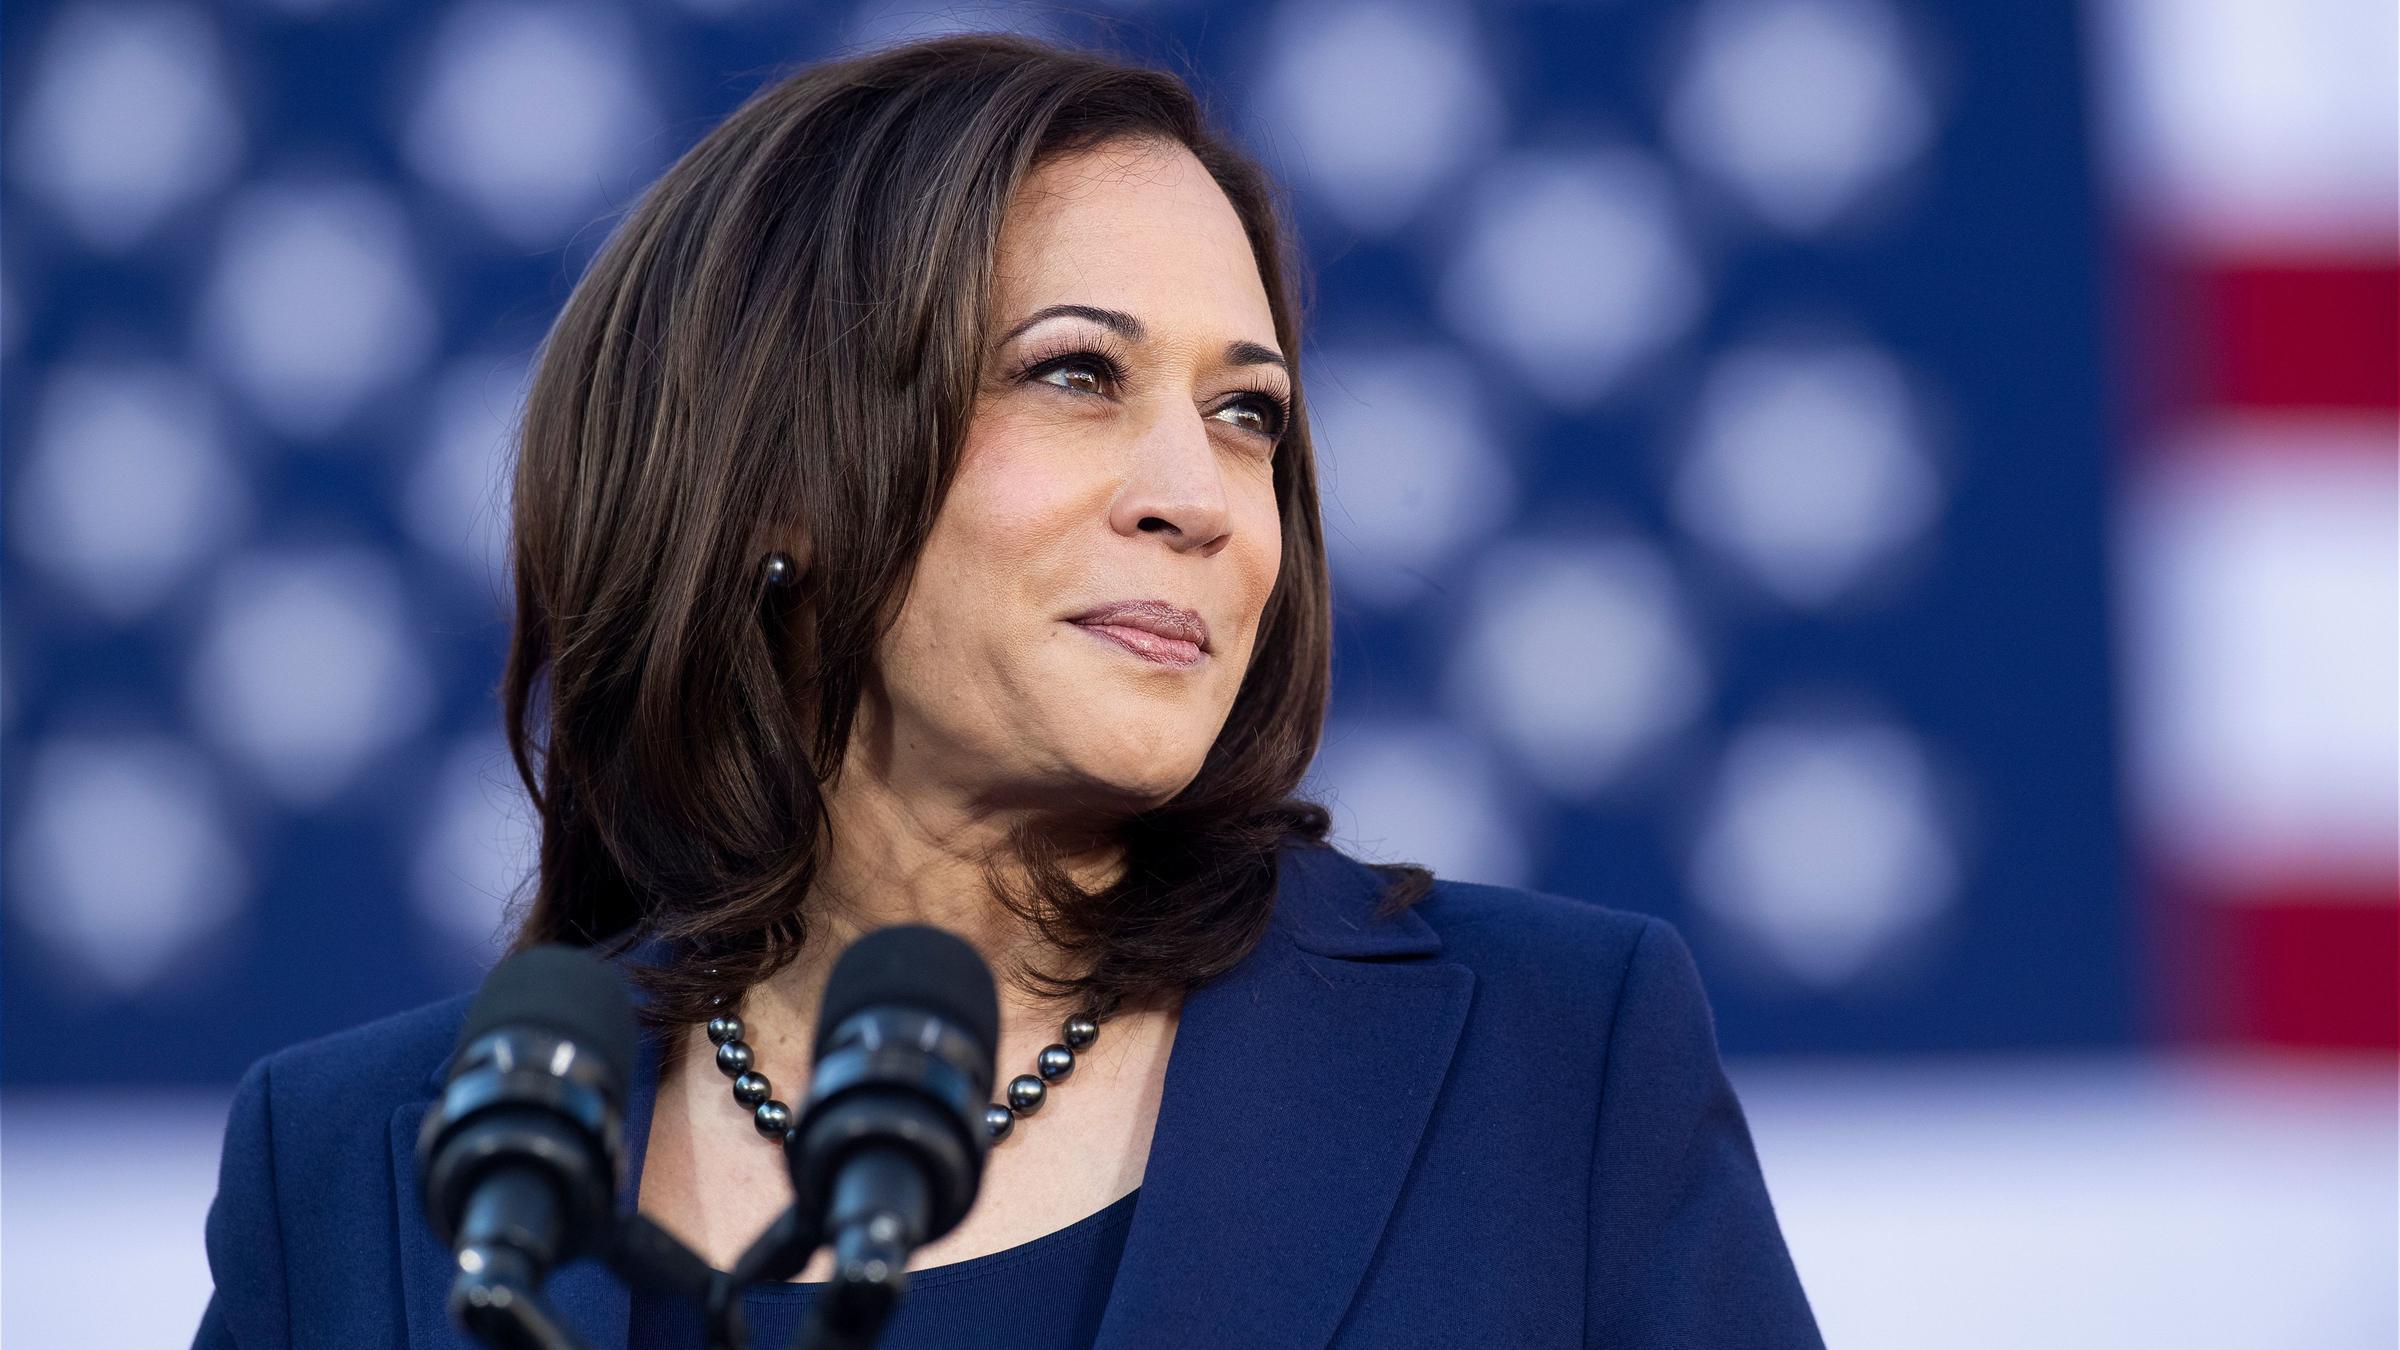 Kamala Harris: America's first woman vice president